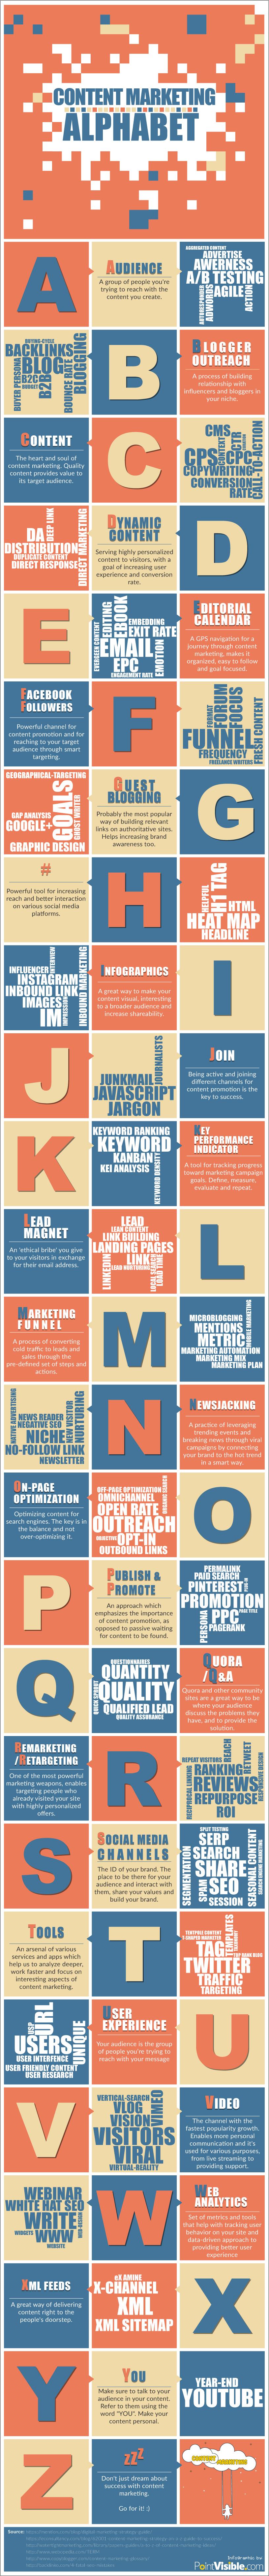 Back to Basics: Content Marketing Alphabet [Infographic] | Social Media Today